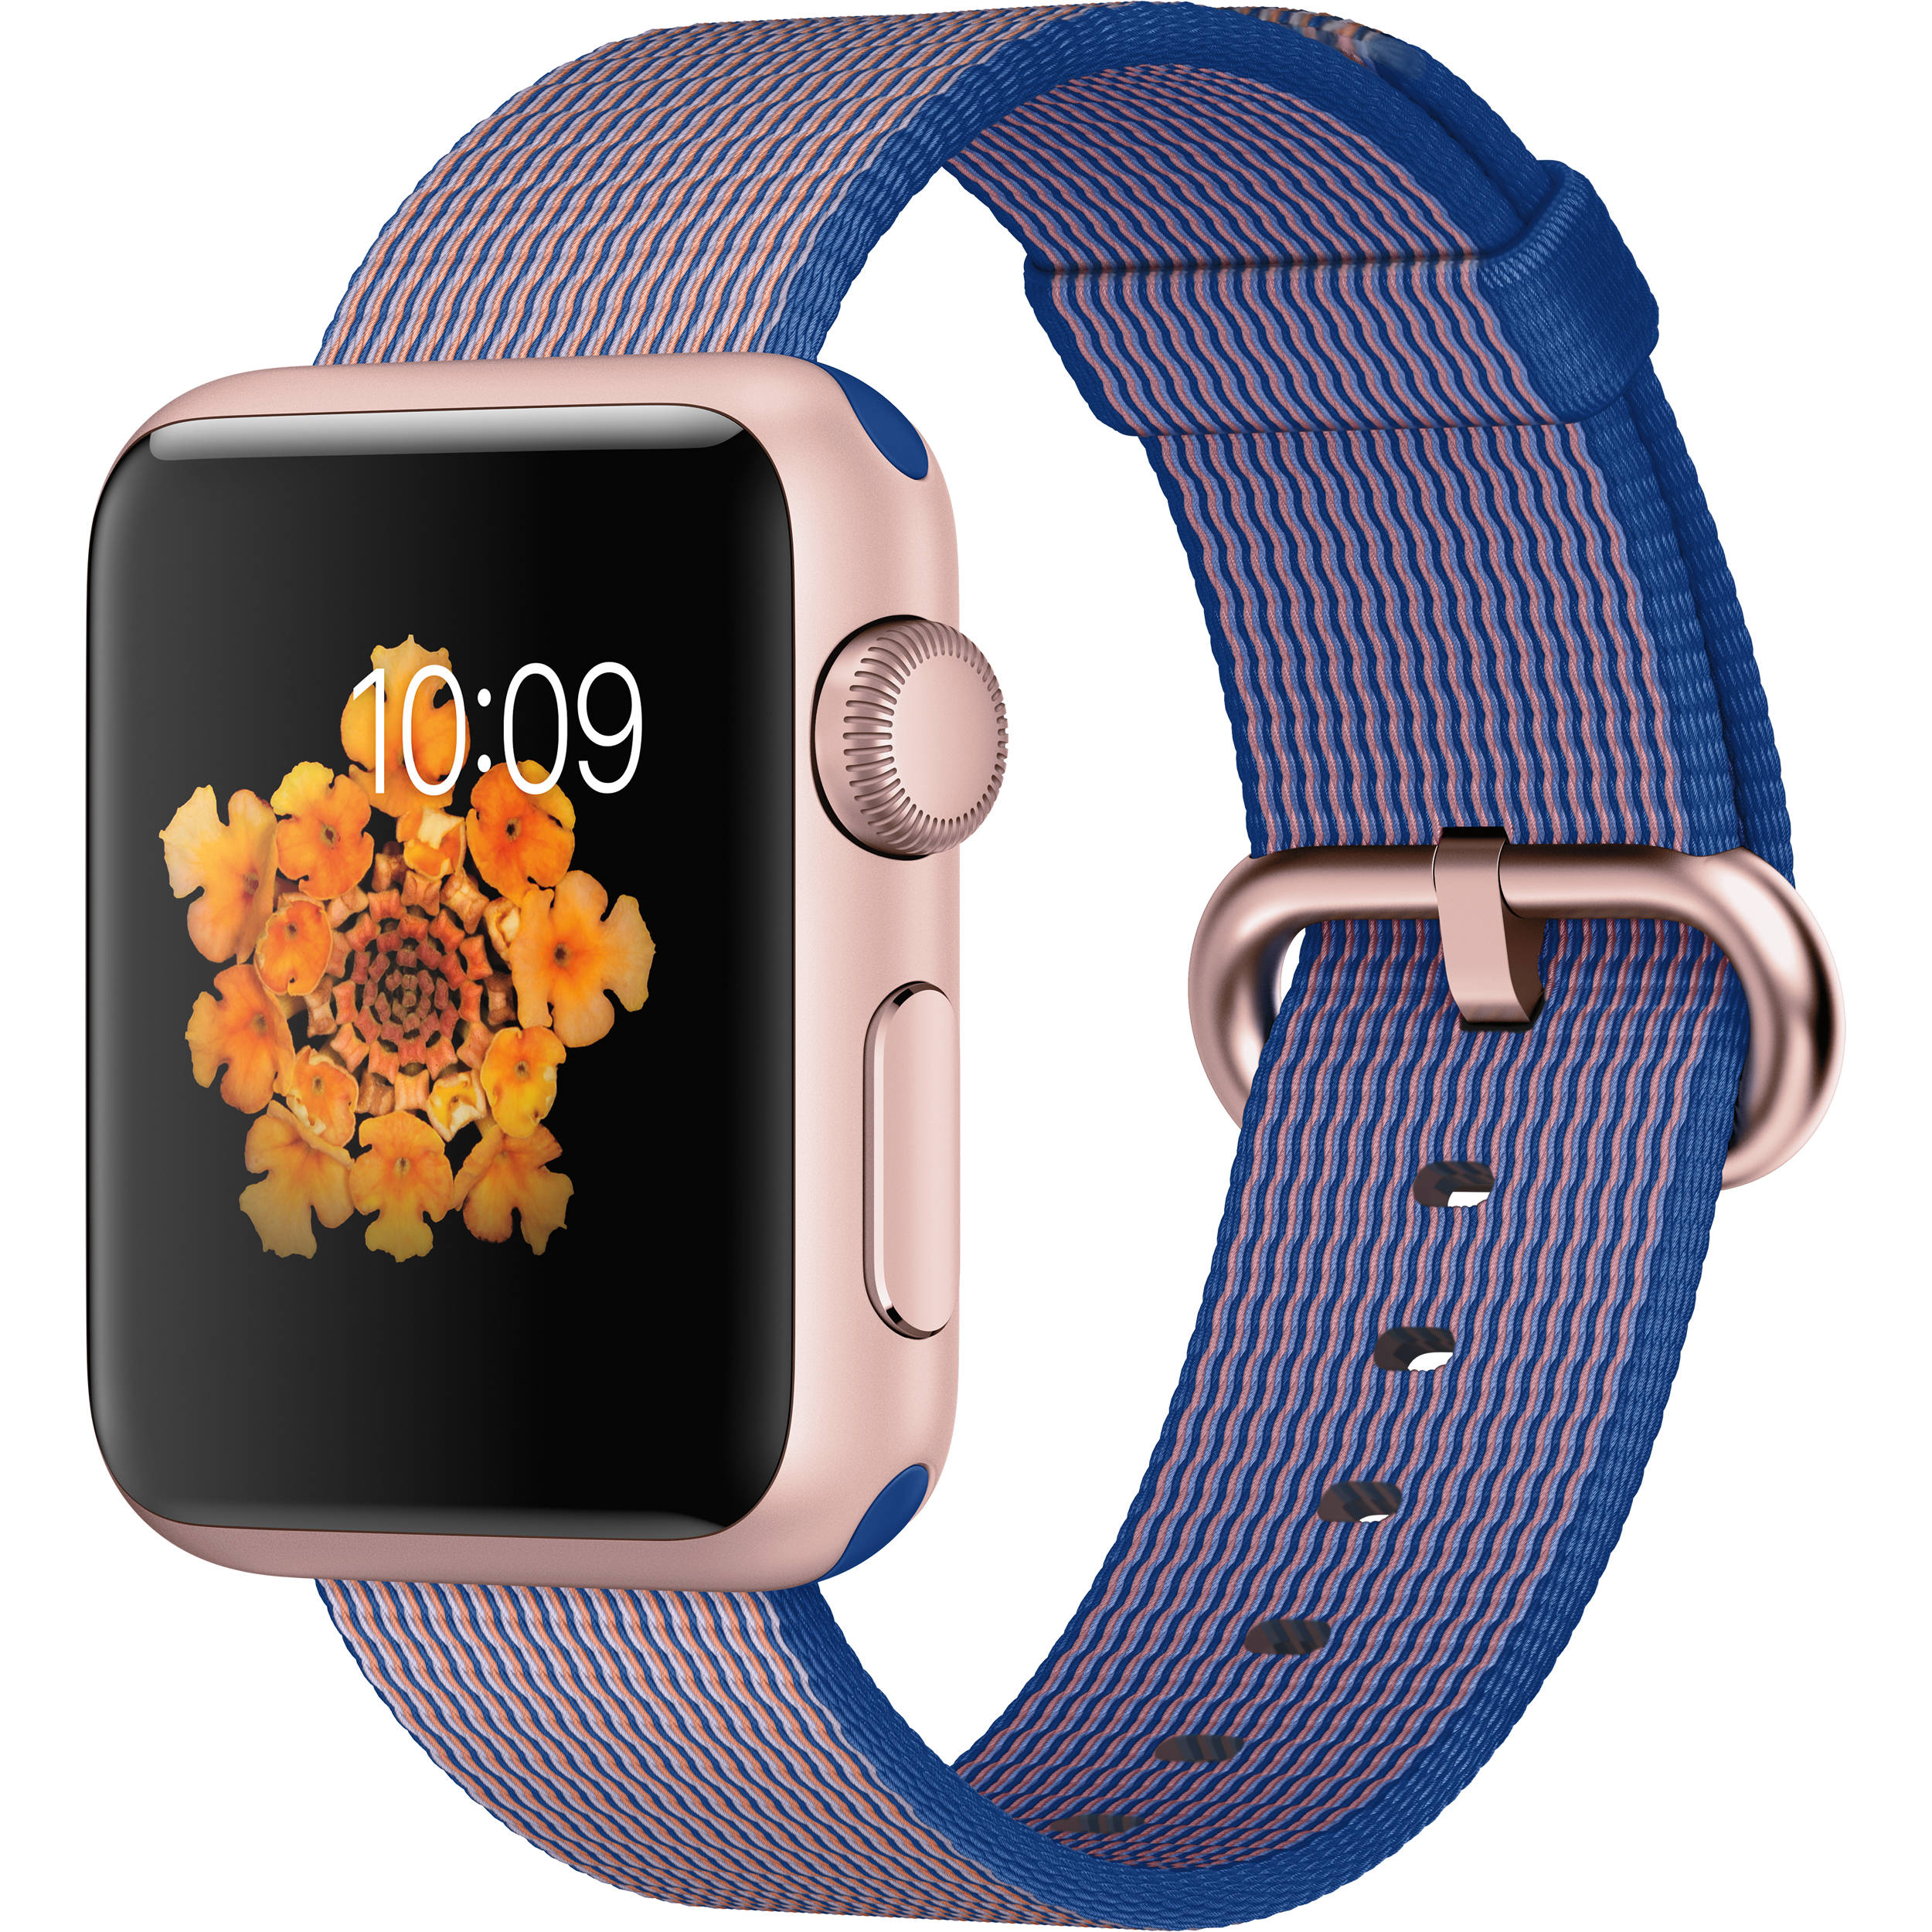 best sneakers 68571 e4b40 Apple Watch Sport 38mm Smartwatch (2015, Rose Gold Aluminum Case, Royal  Blue Woven Nylon Band)